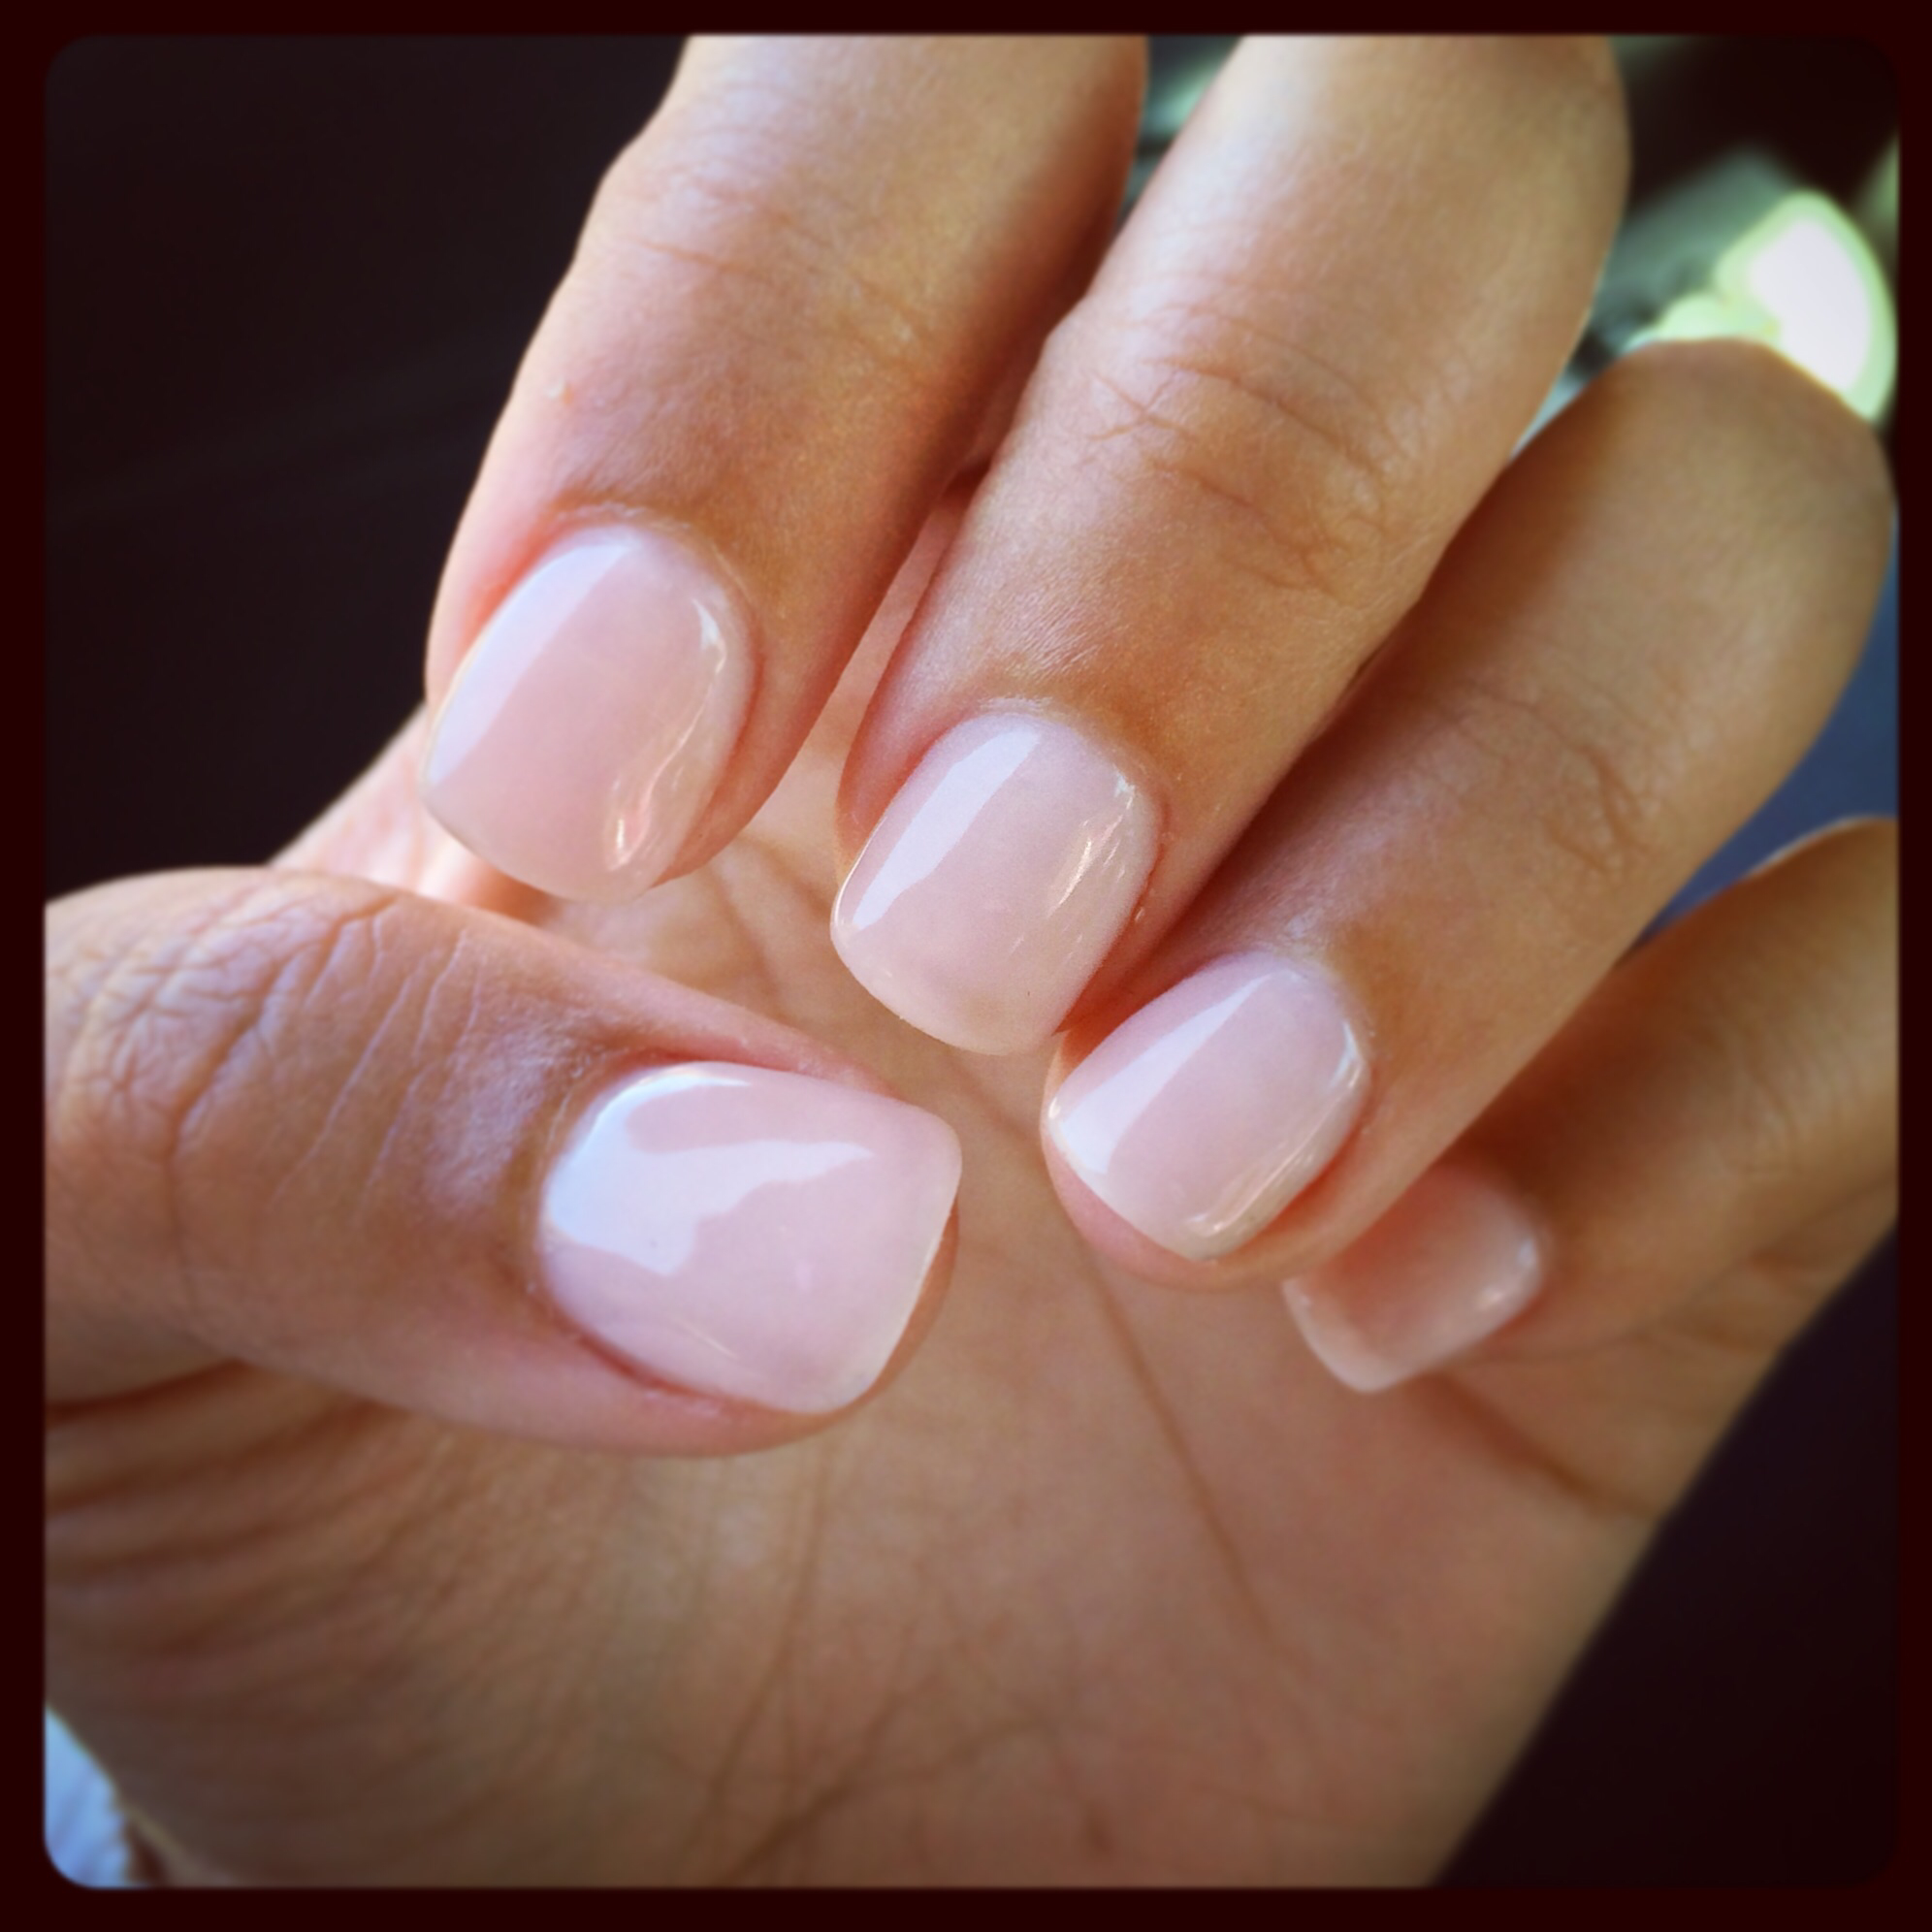 acrylic on real nails photo - 1